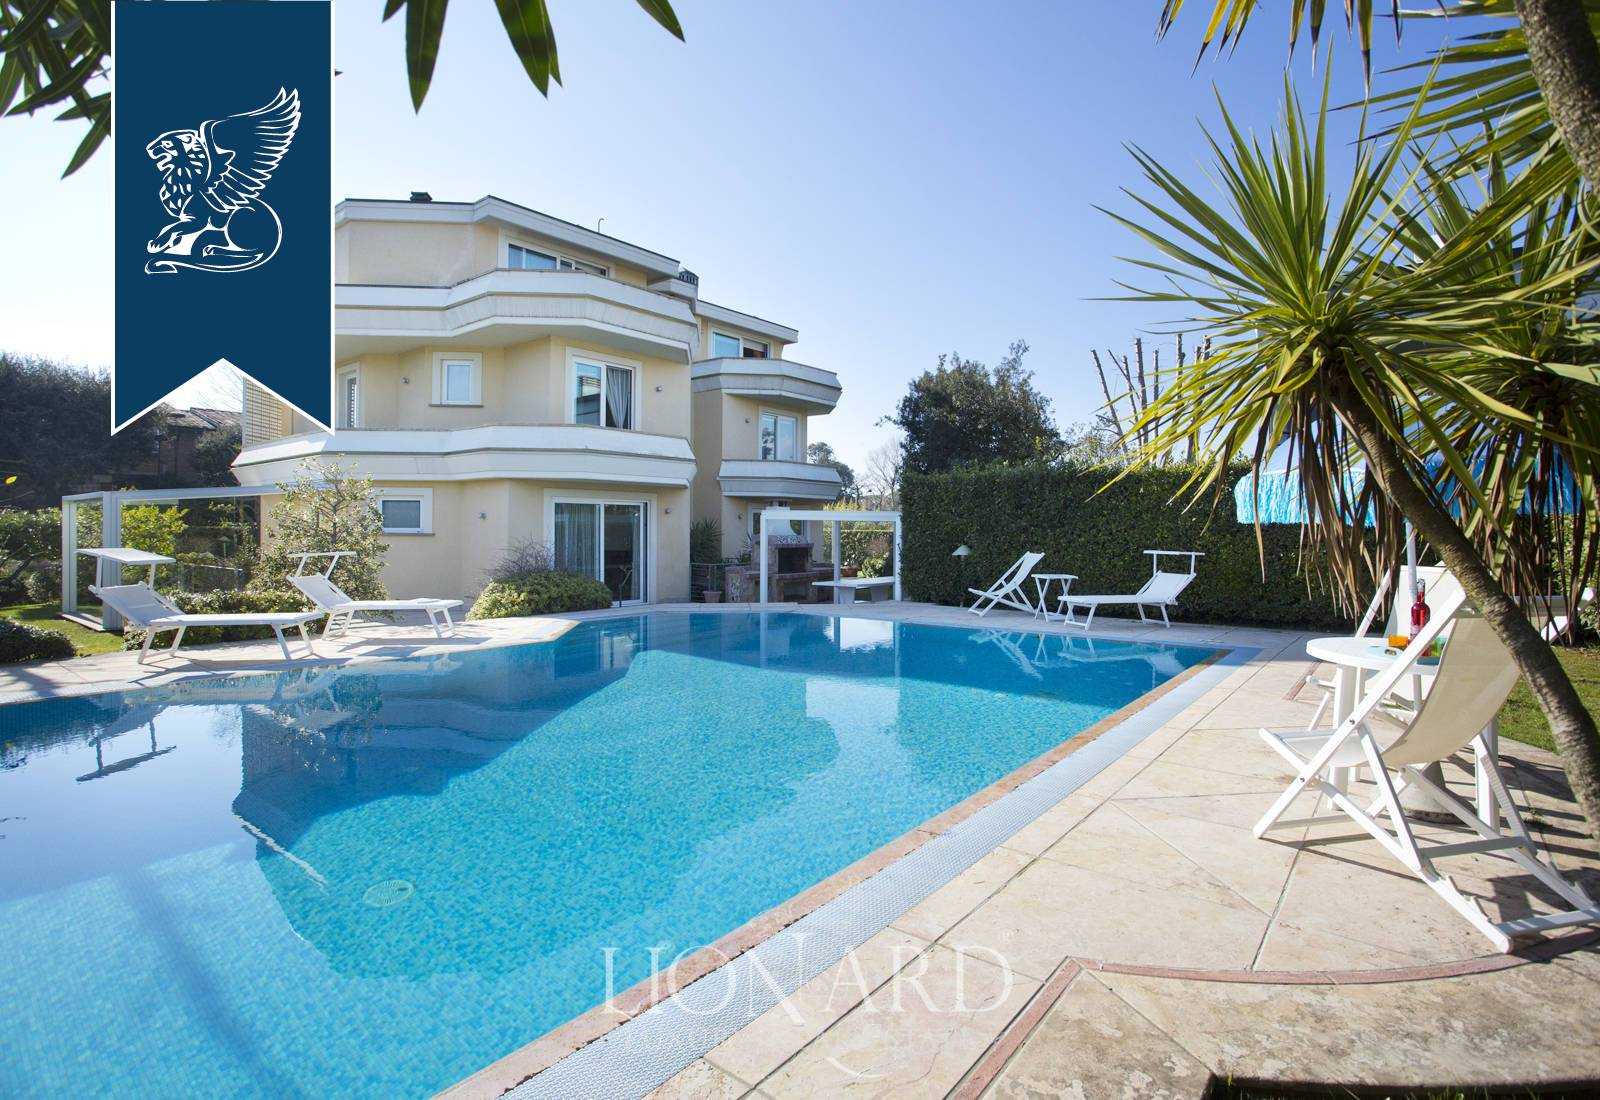 Villa in Vendita a Camaiore: 0 locali, 600 mq - Foto 2